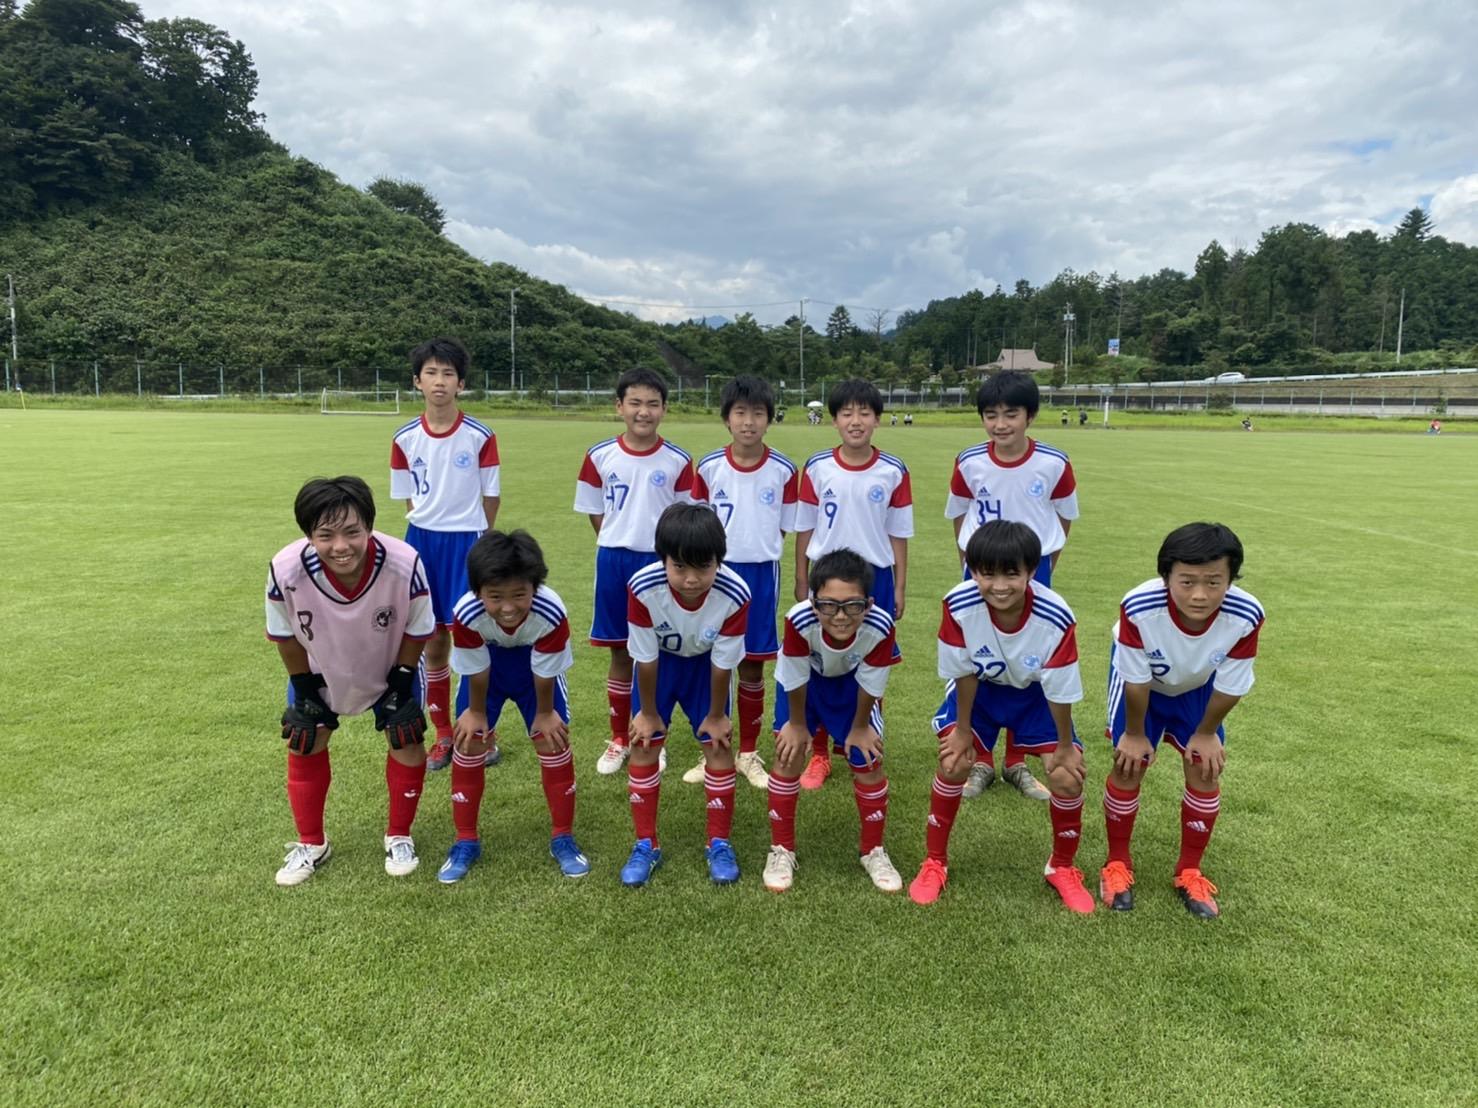 三多摩SSリーグ(U-13)vs ZION FC・TM vs トレドSC